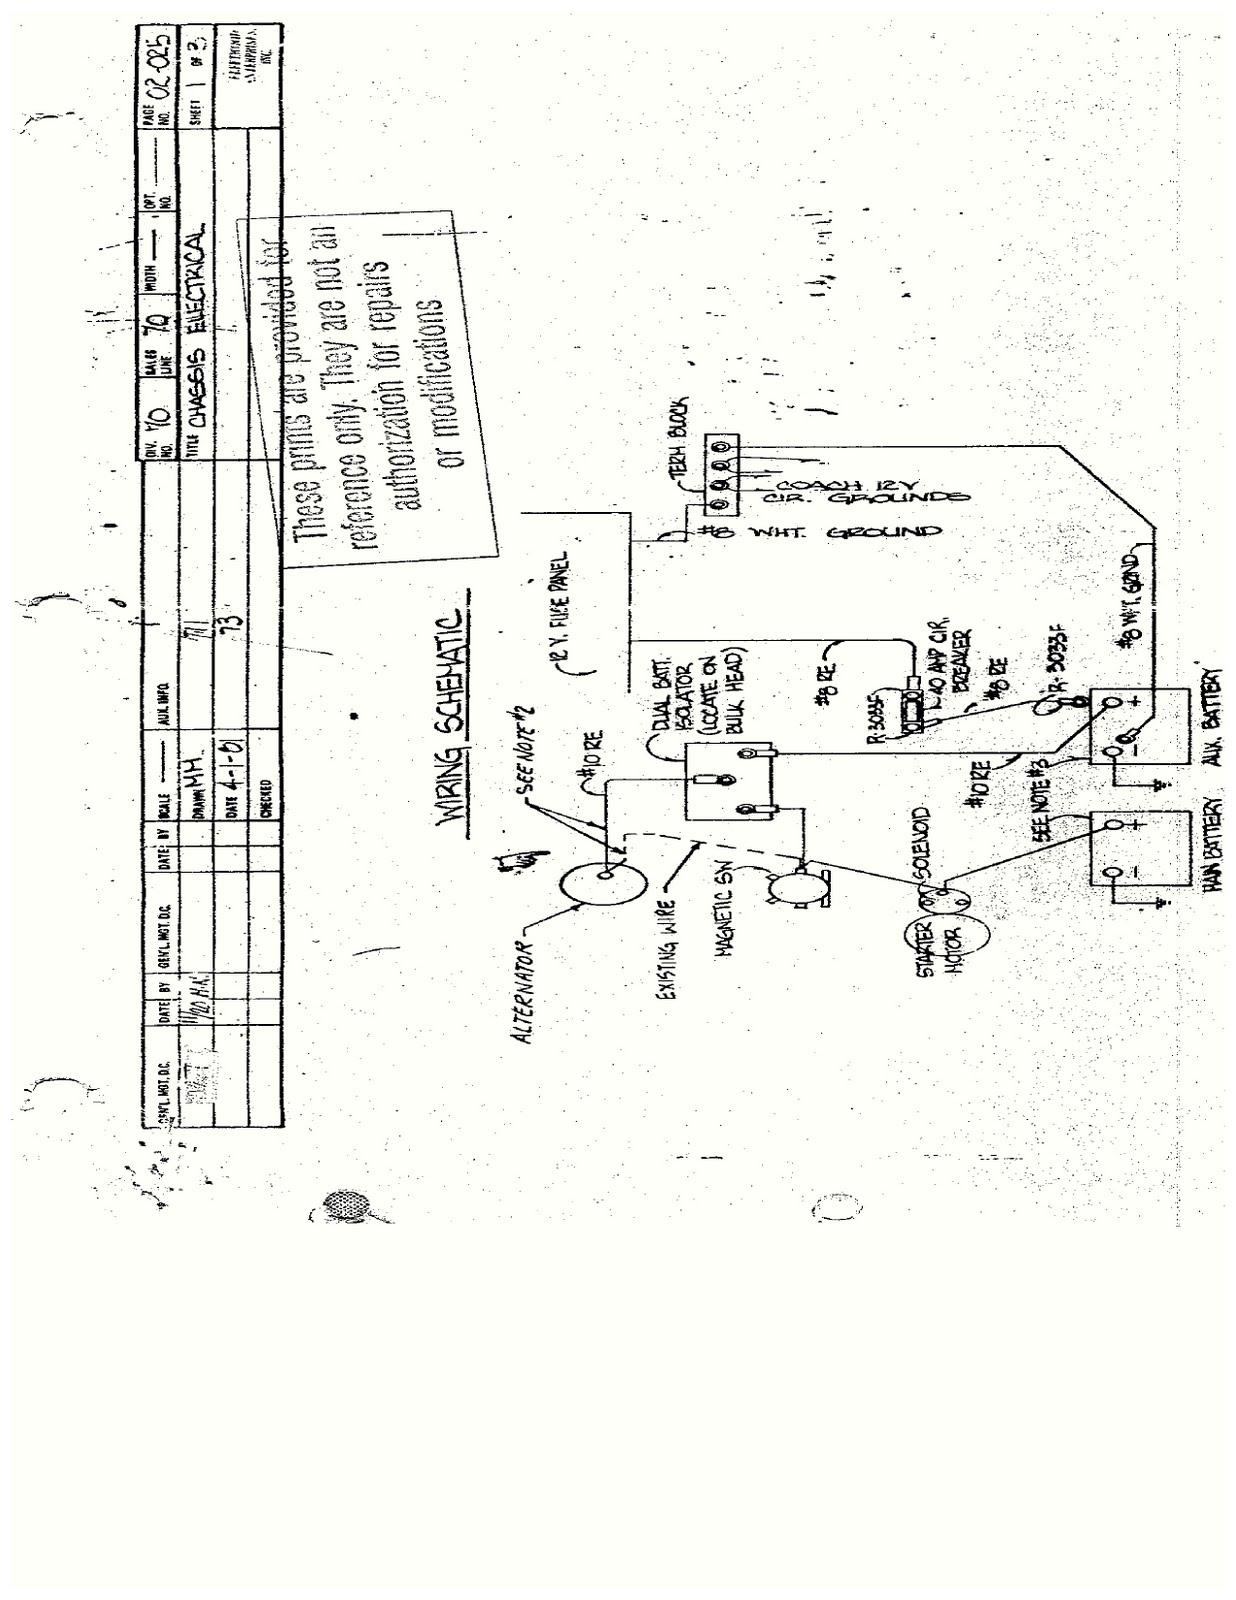 hight resolution of 1984 pontiac fiero fuse box diagram 1986 pontiac fiero 97 chevy p30 dashboard 97 chevy malibu